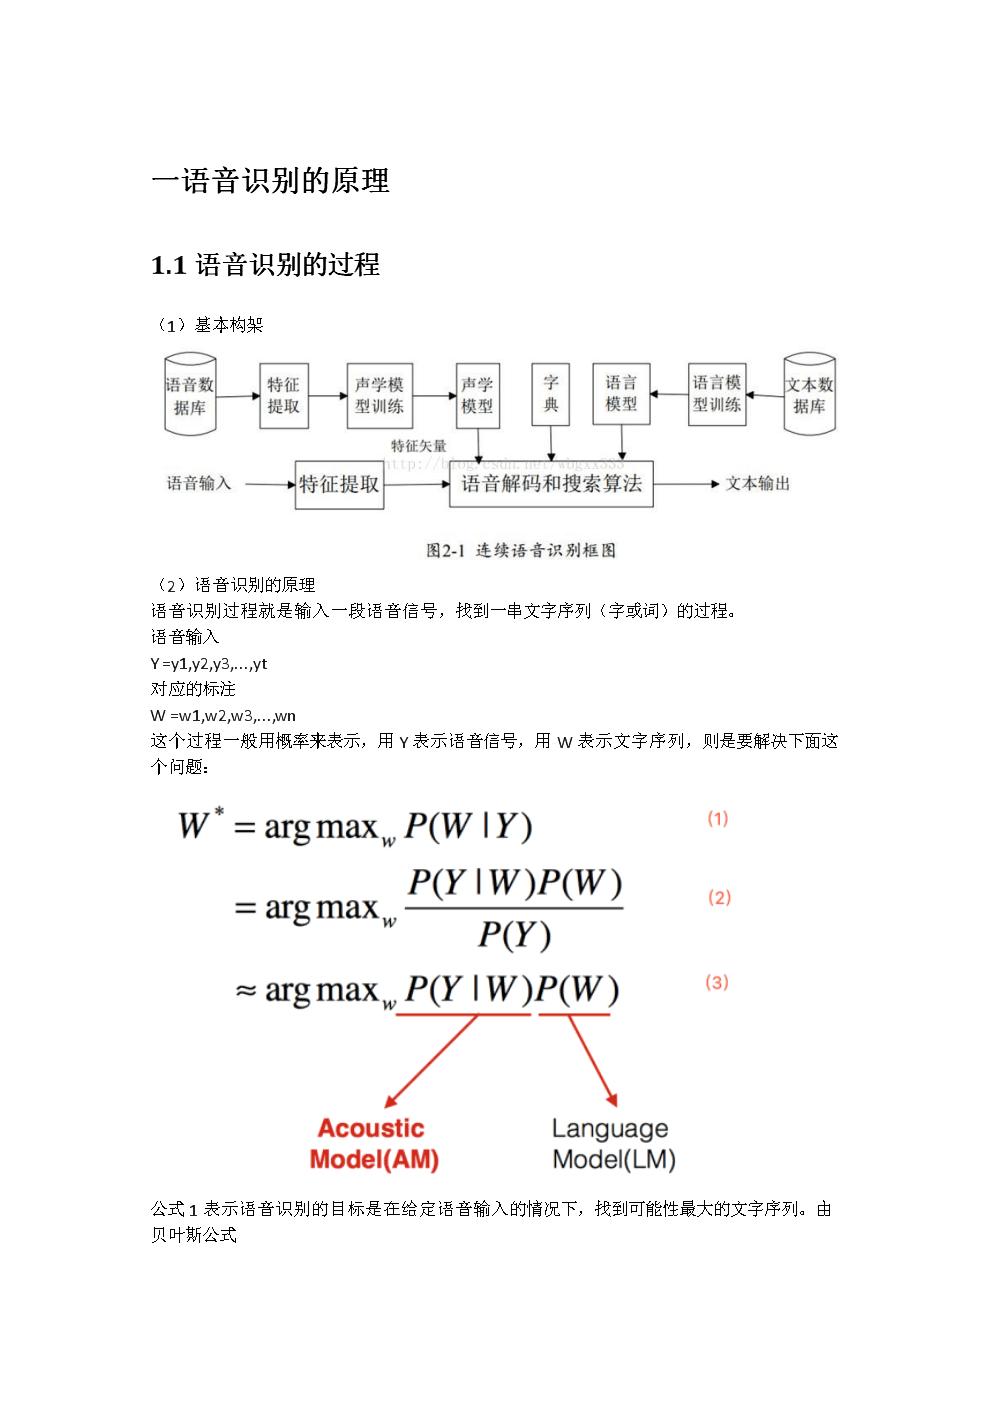 kaldi基础知识整理.docx